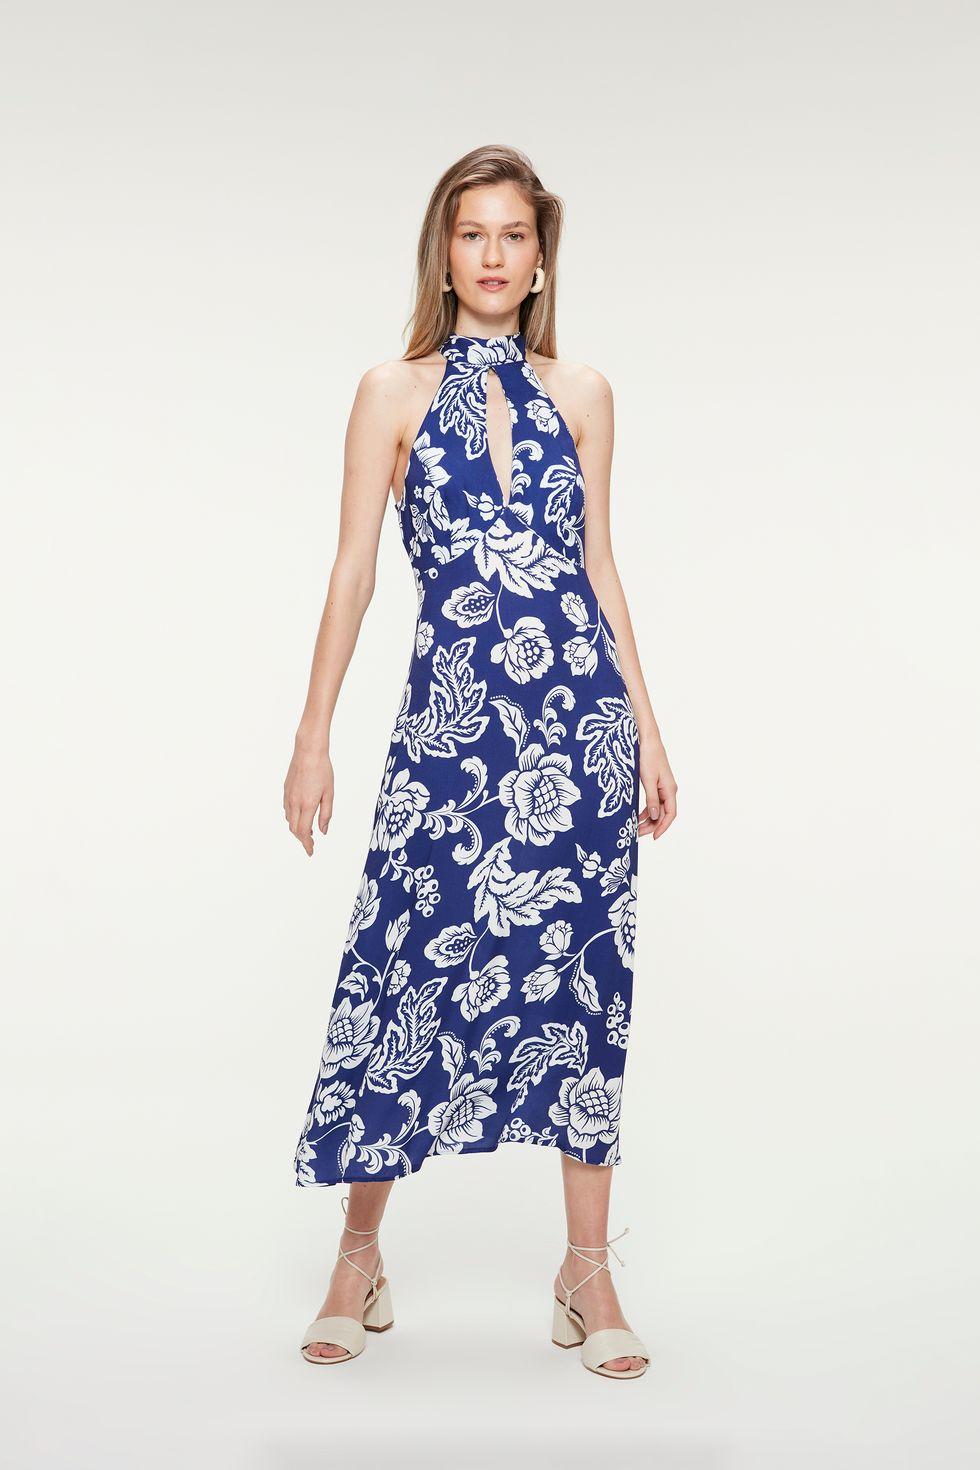 Vestido-Midi-com-Estampa-Floral-Azul-Frente--